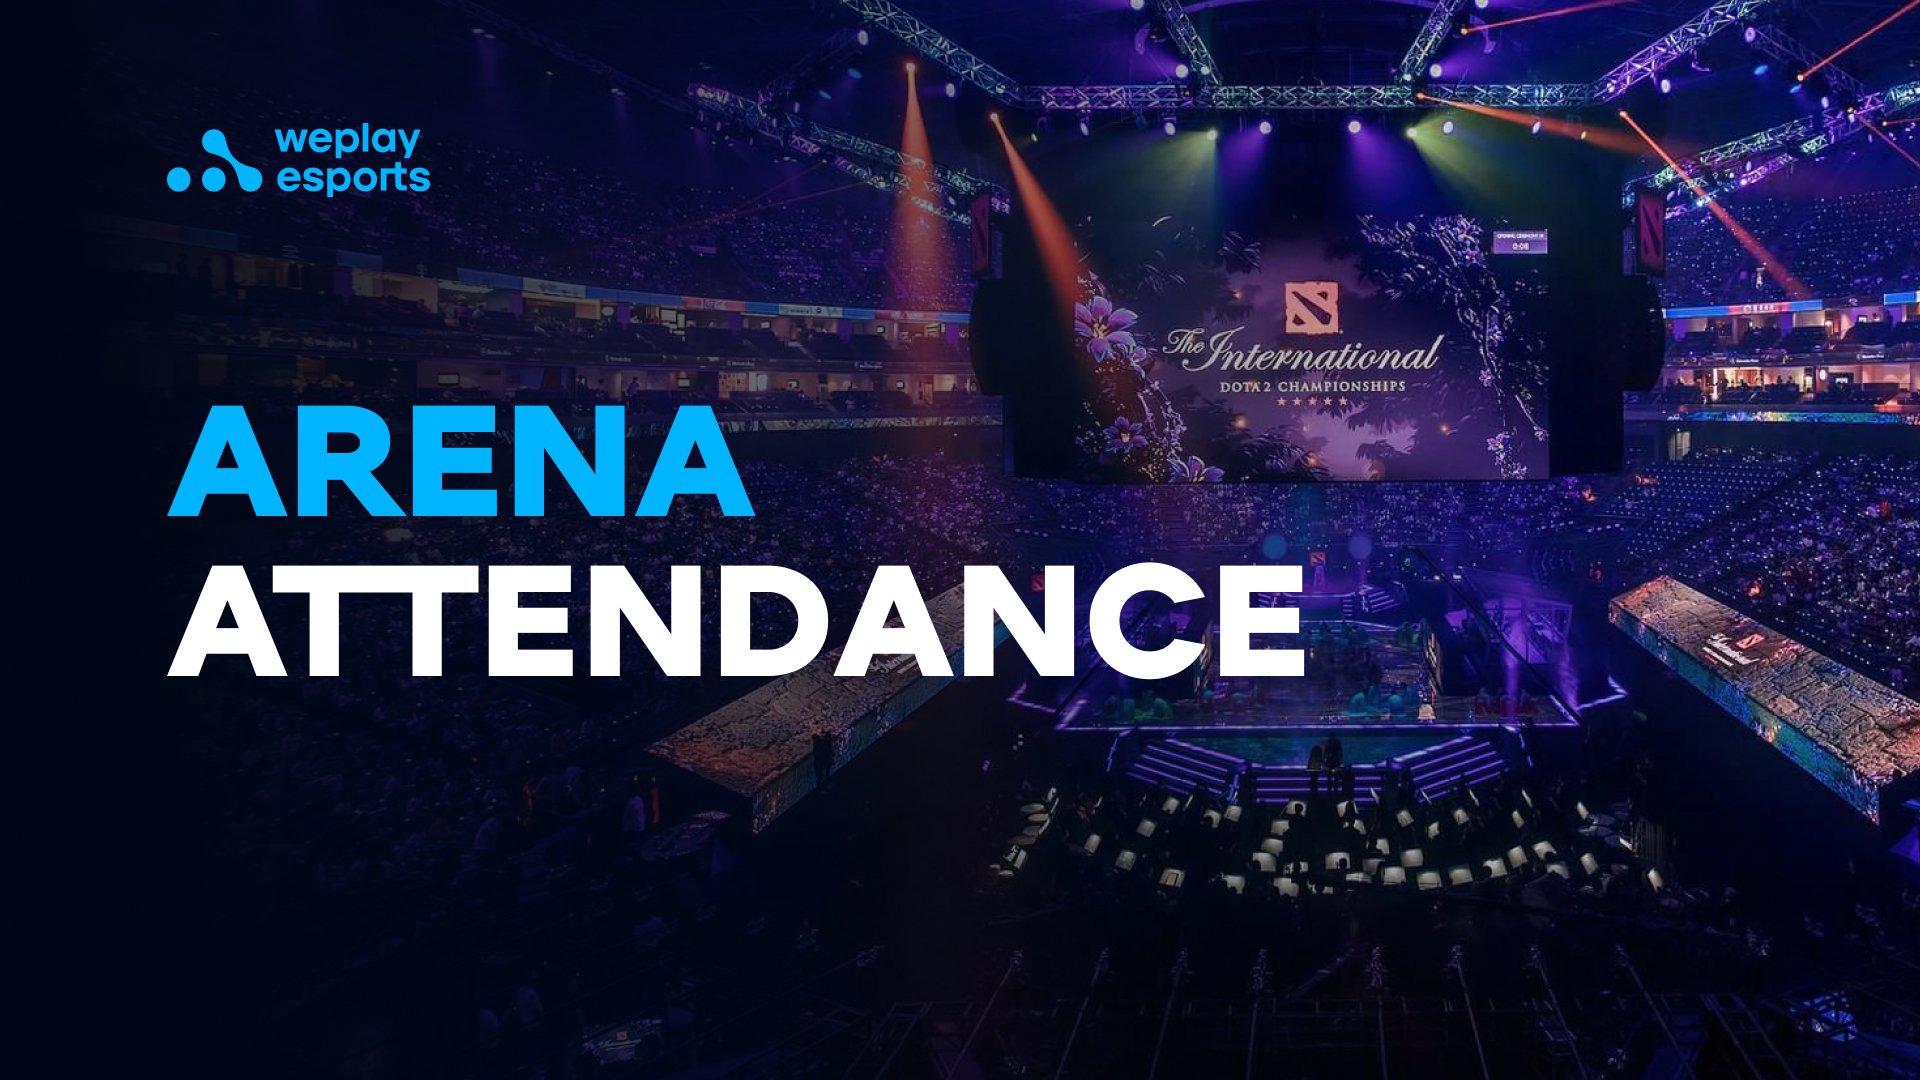 Arena Attendance